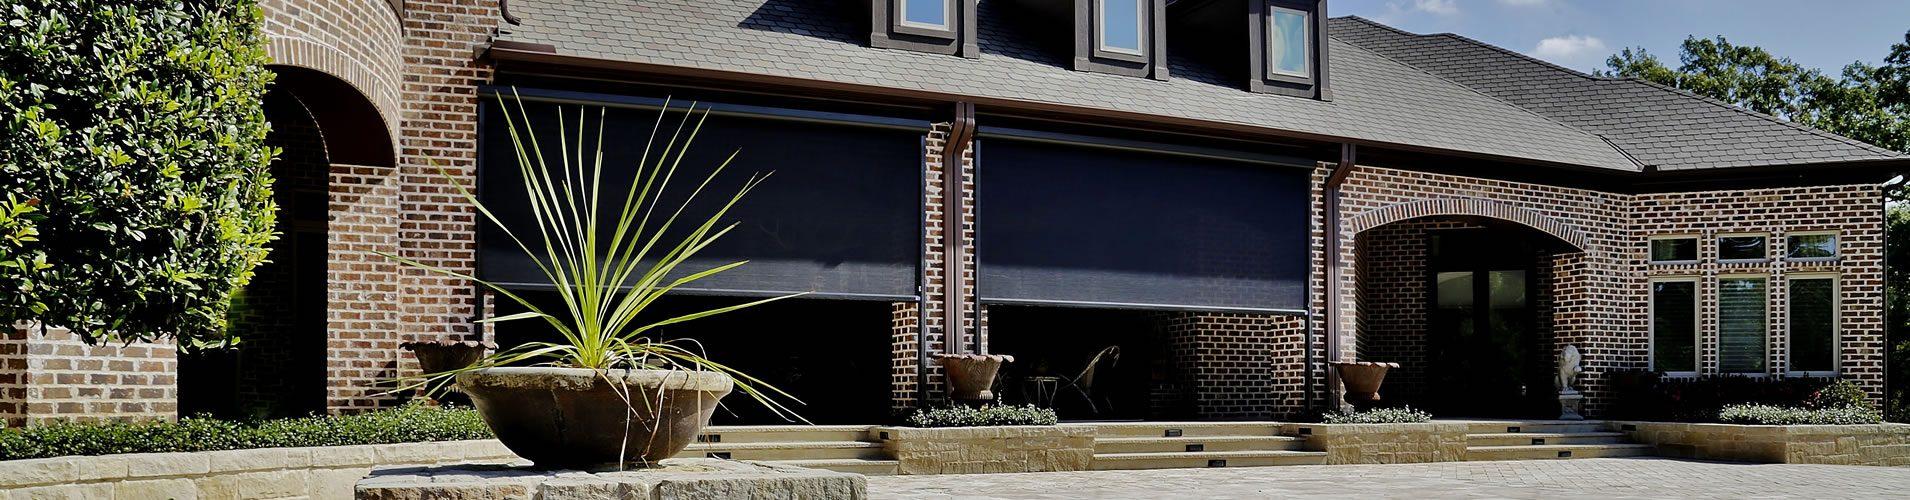 dallas tx motorized patio shades